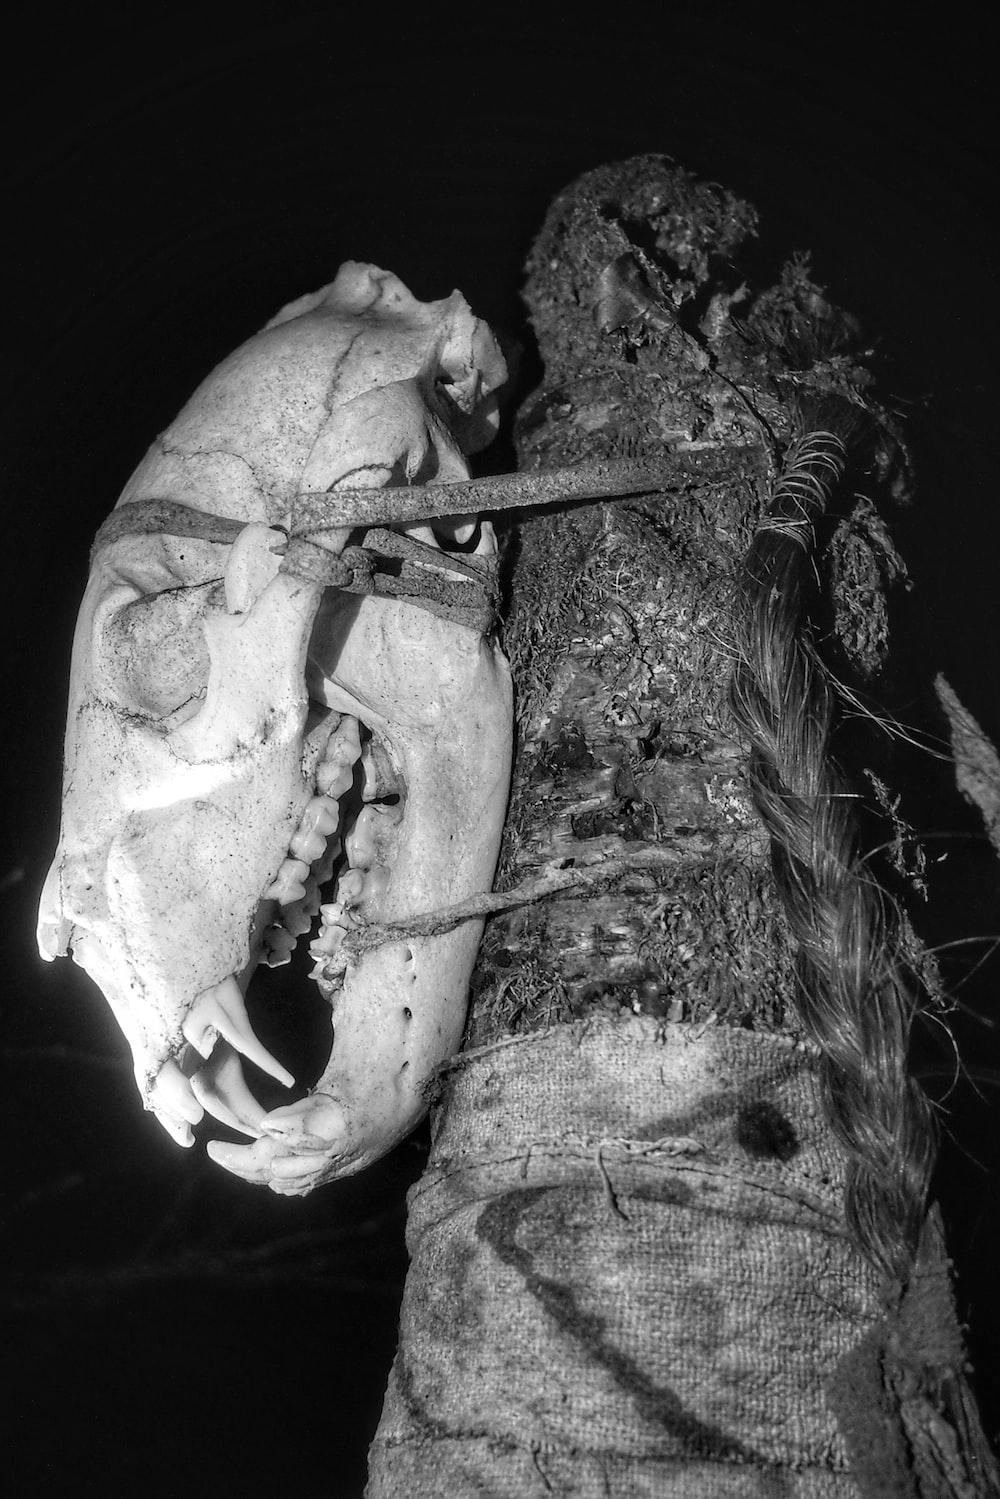 grayscale photo of human skull